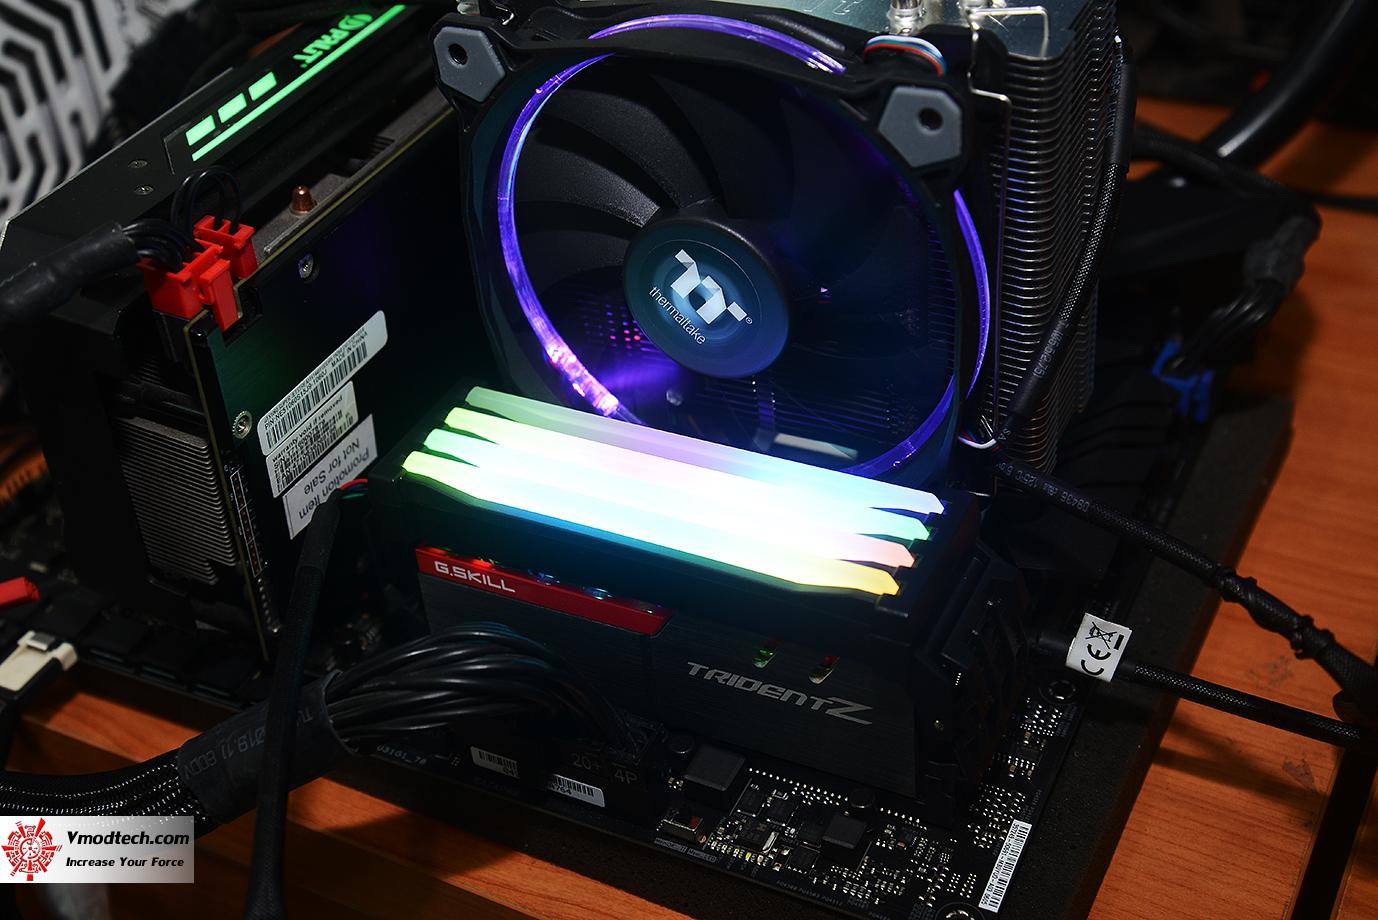 dsc 5564 Thermaltake Pacific R1 Plus DDR4 Memory Lighting Kit Review